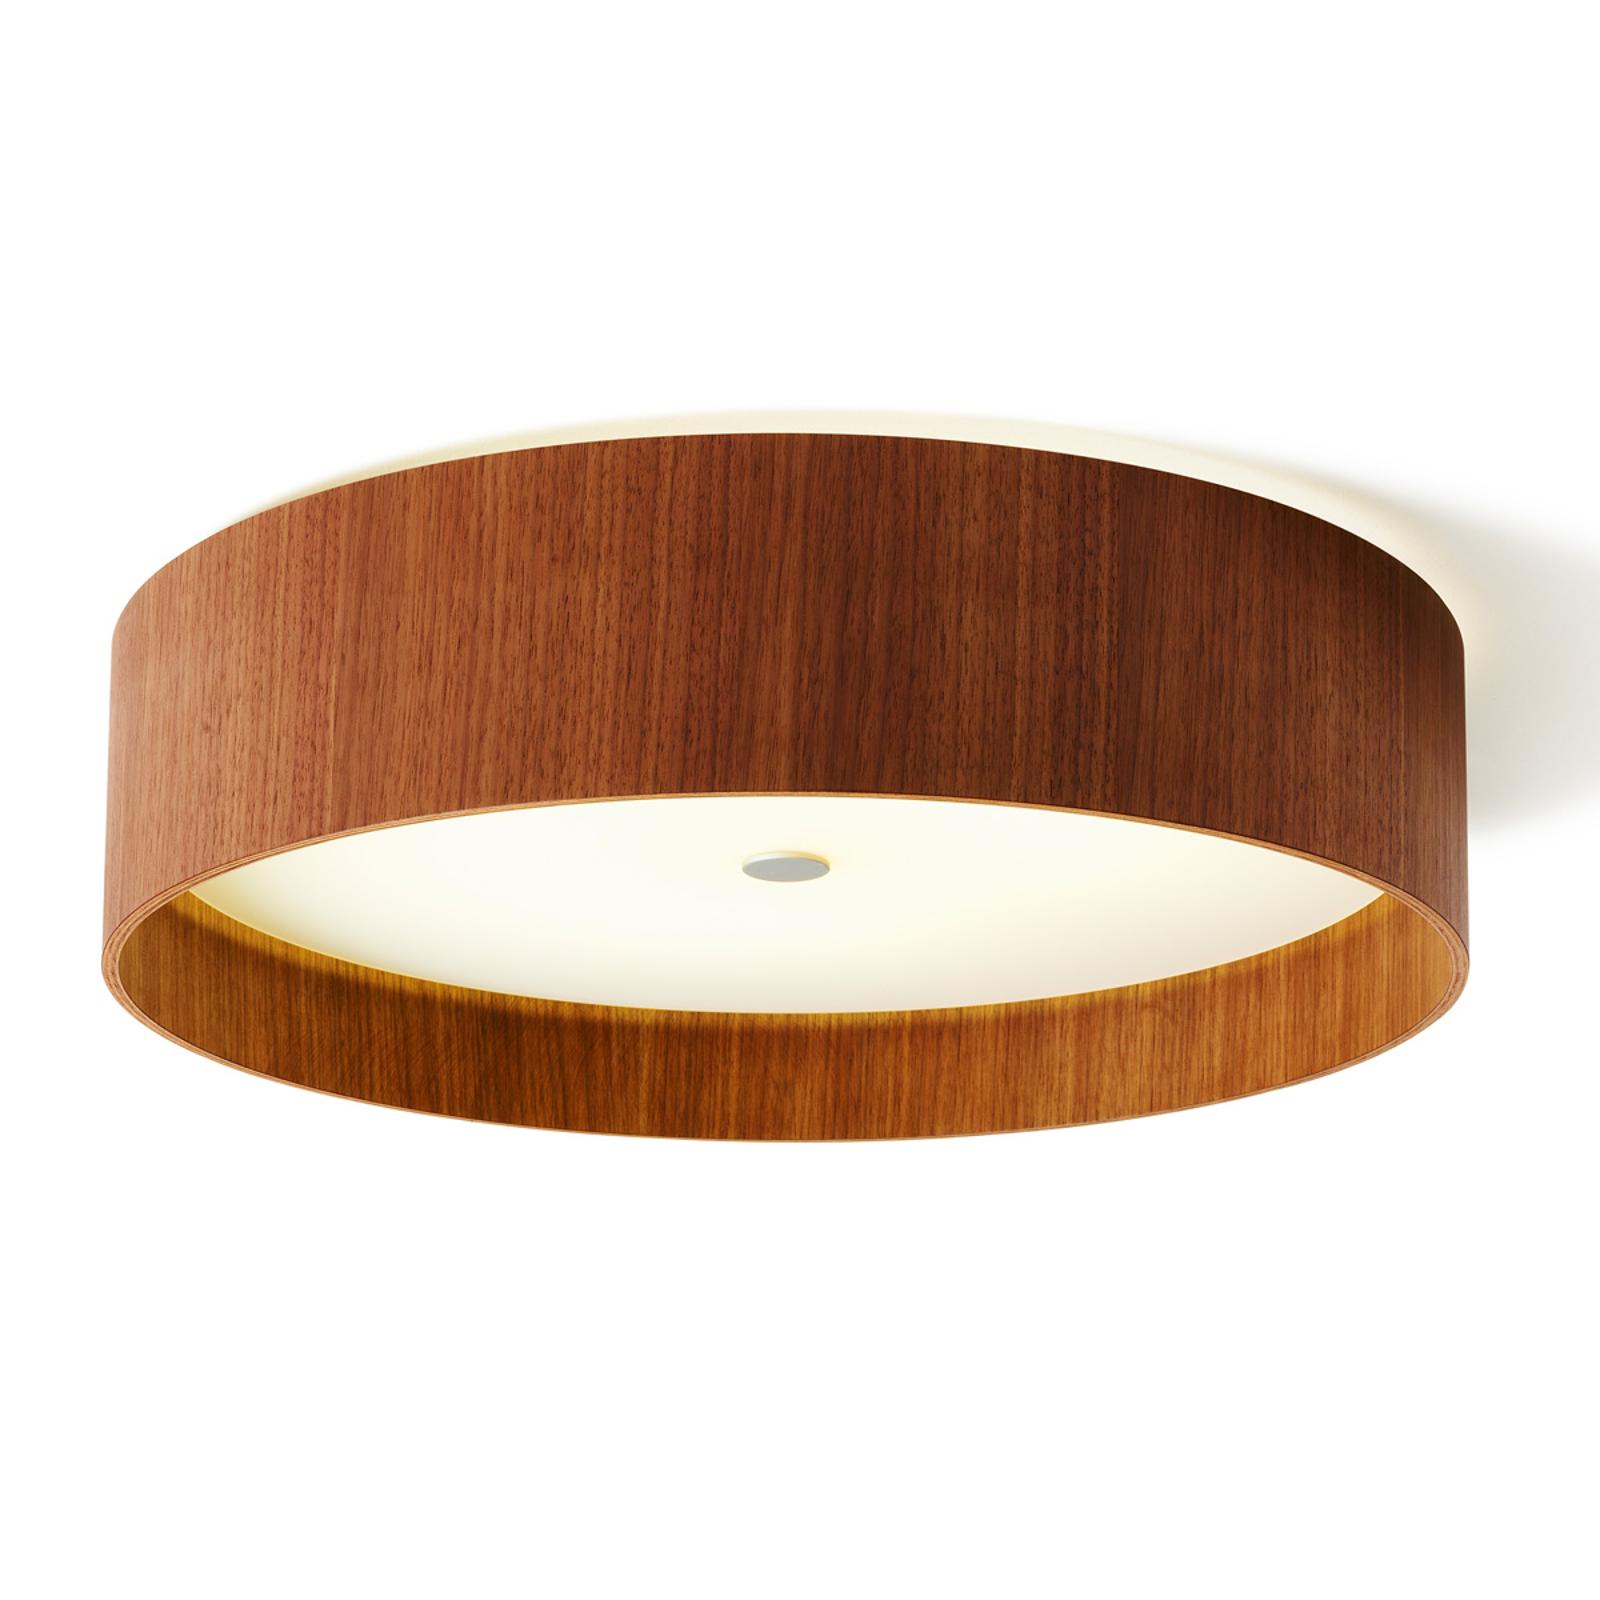 Lara wood – LED-taklampe i nøttetre 55 cm